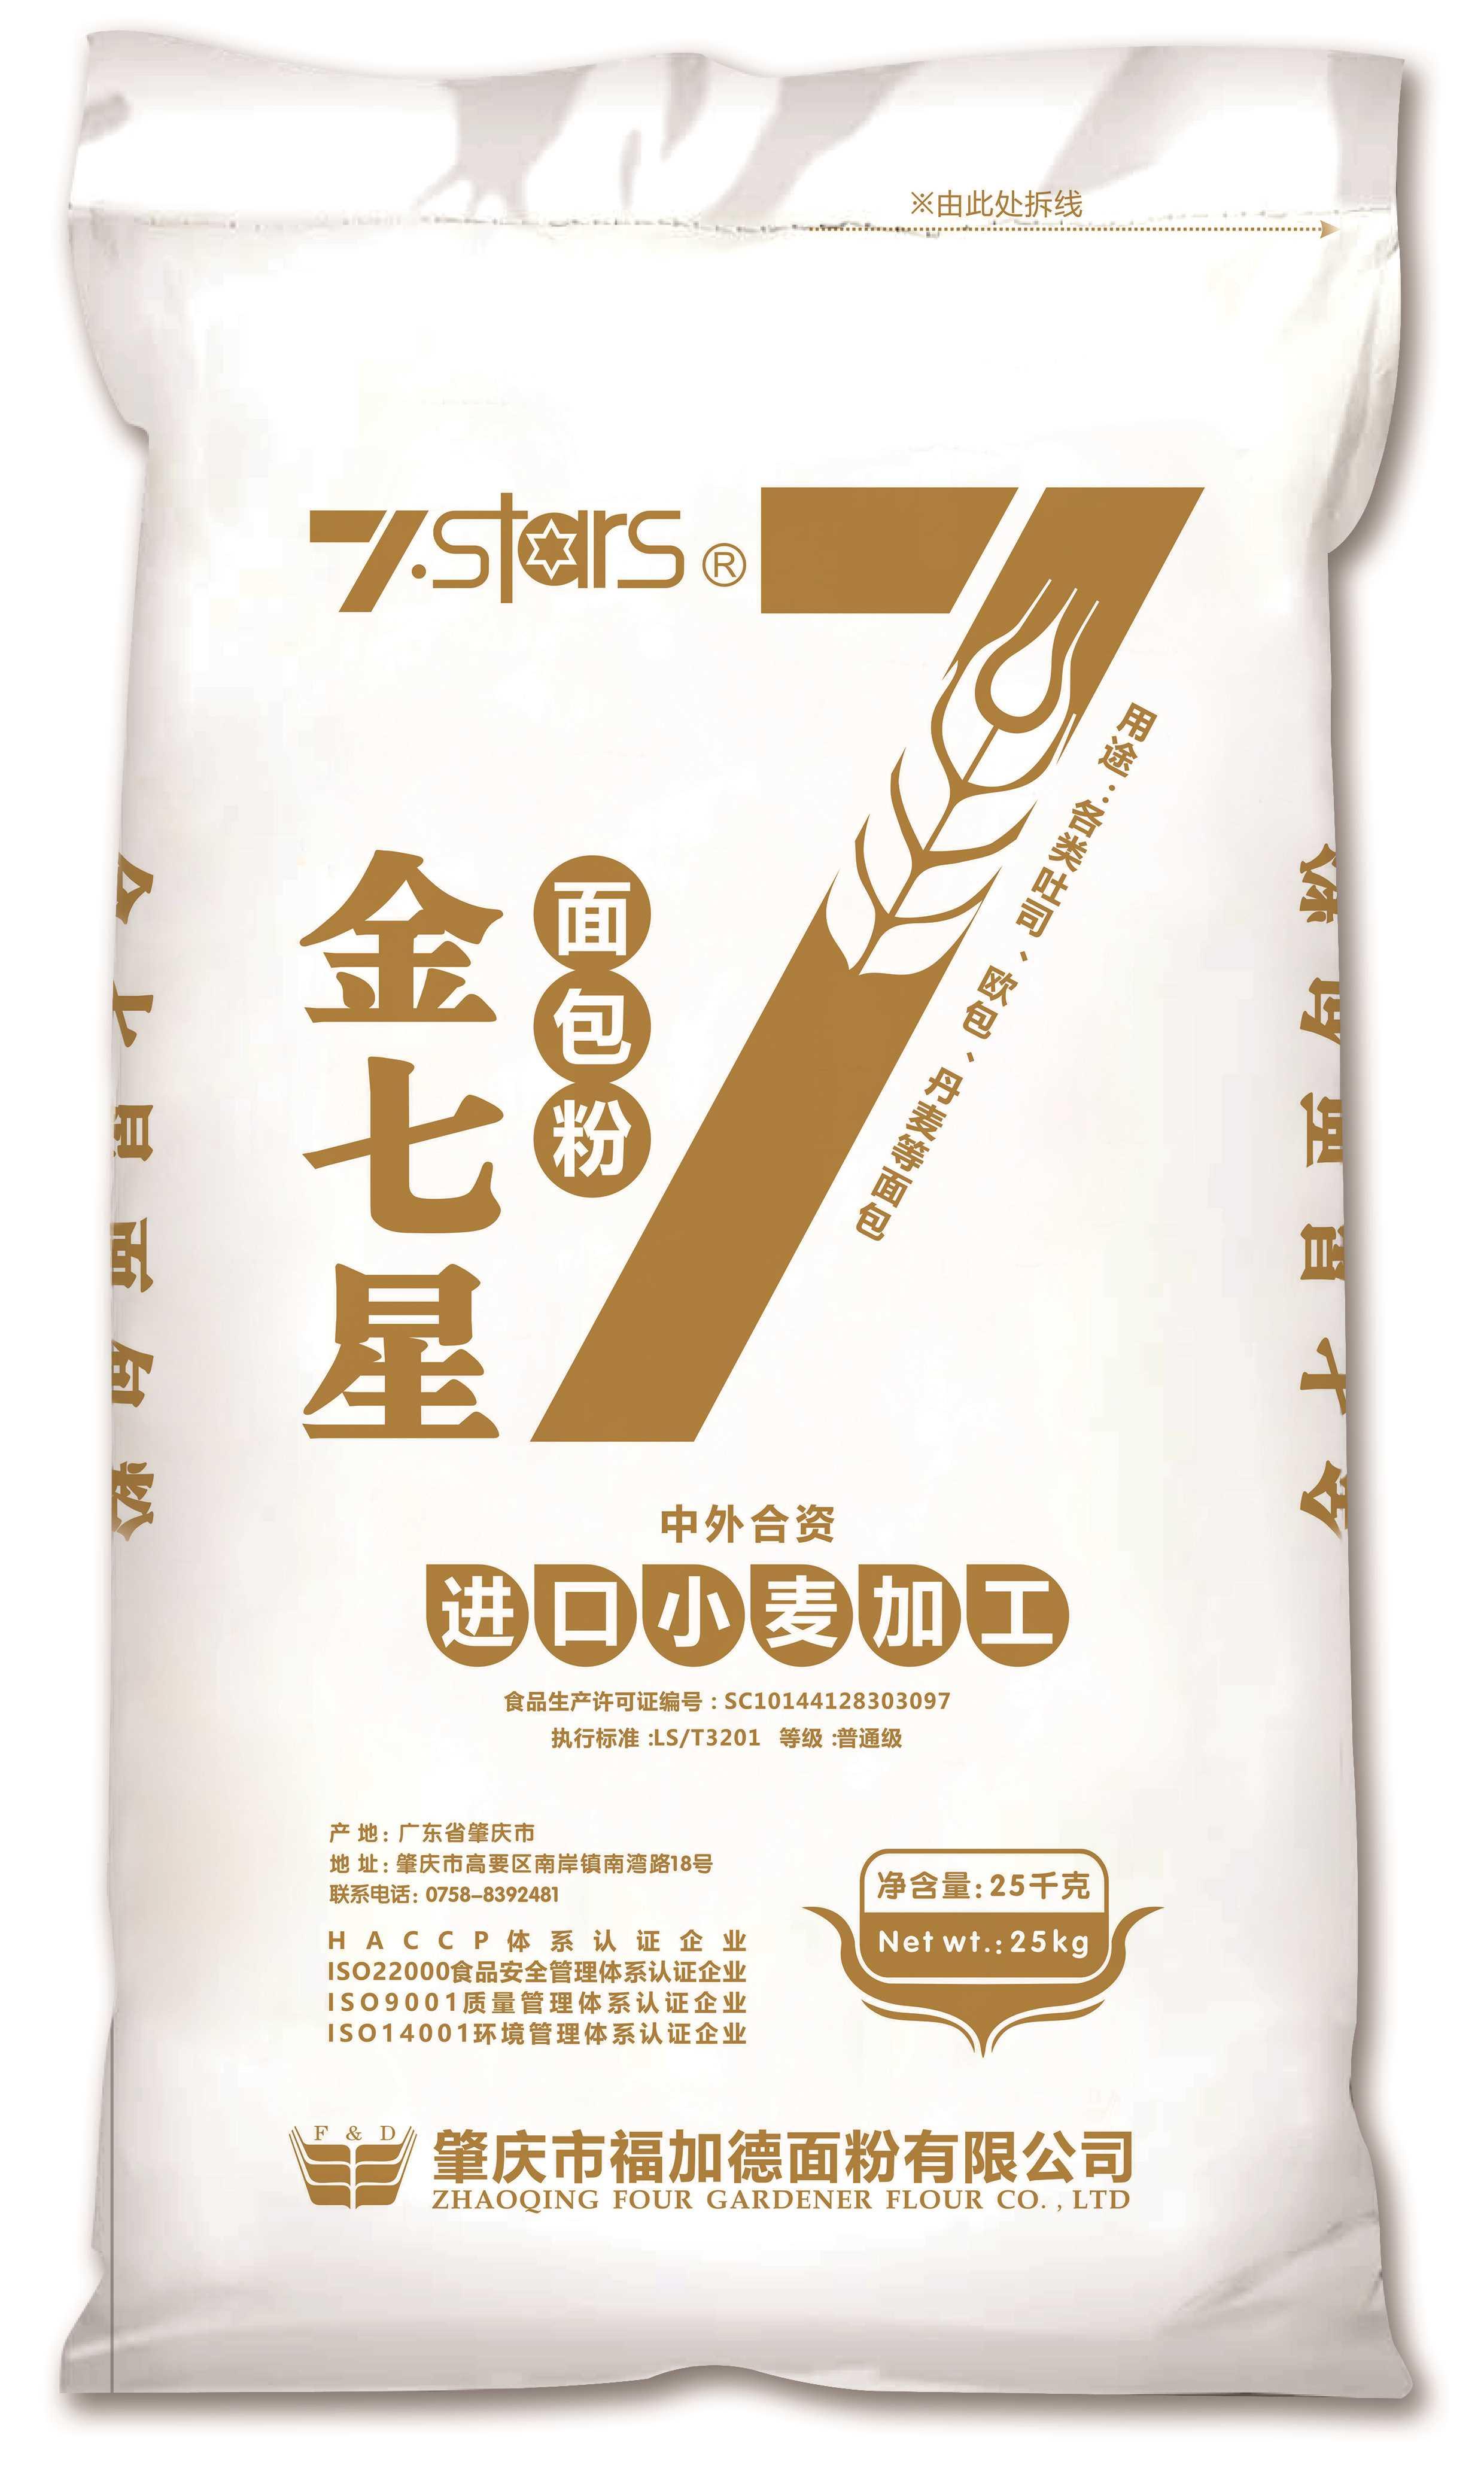 06-金七星面包粉编织袋25kg